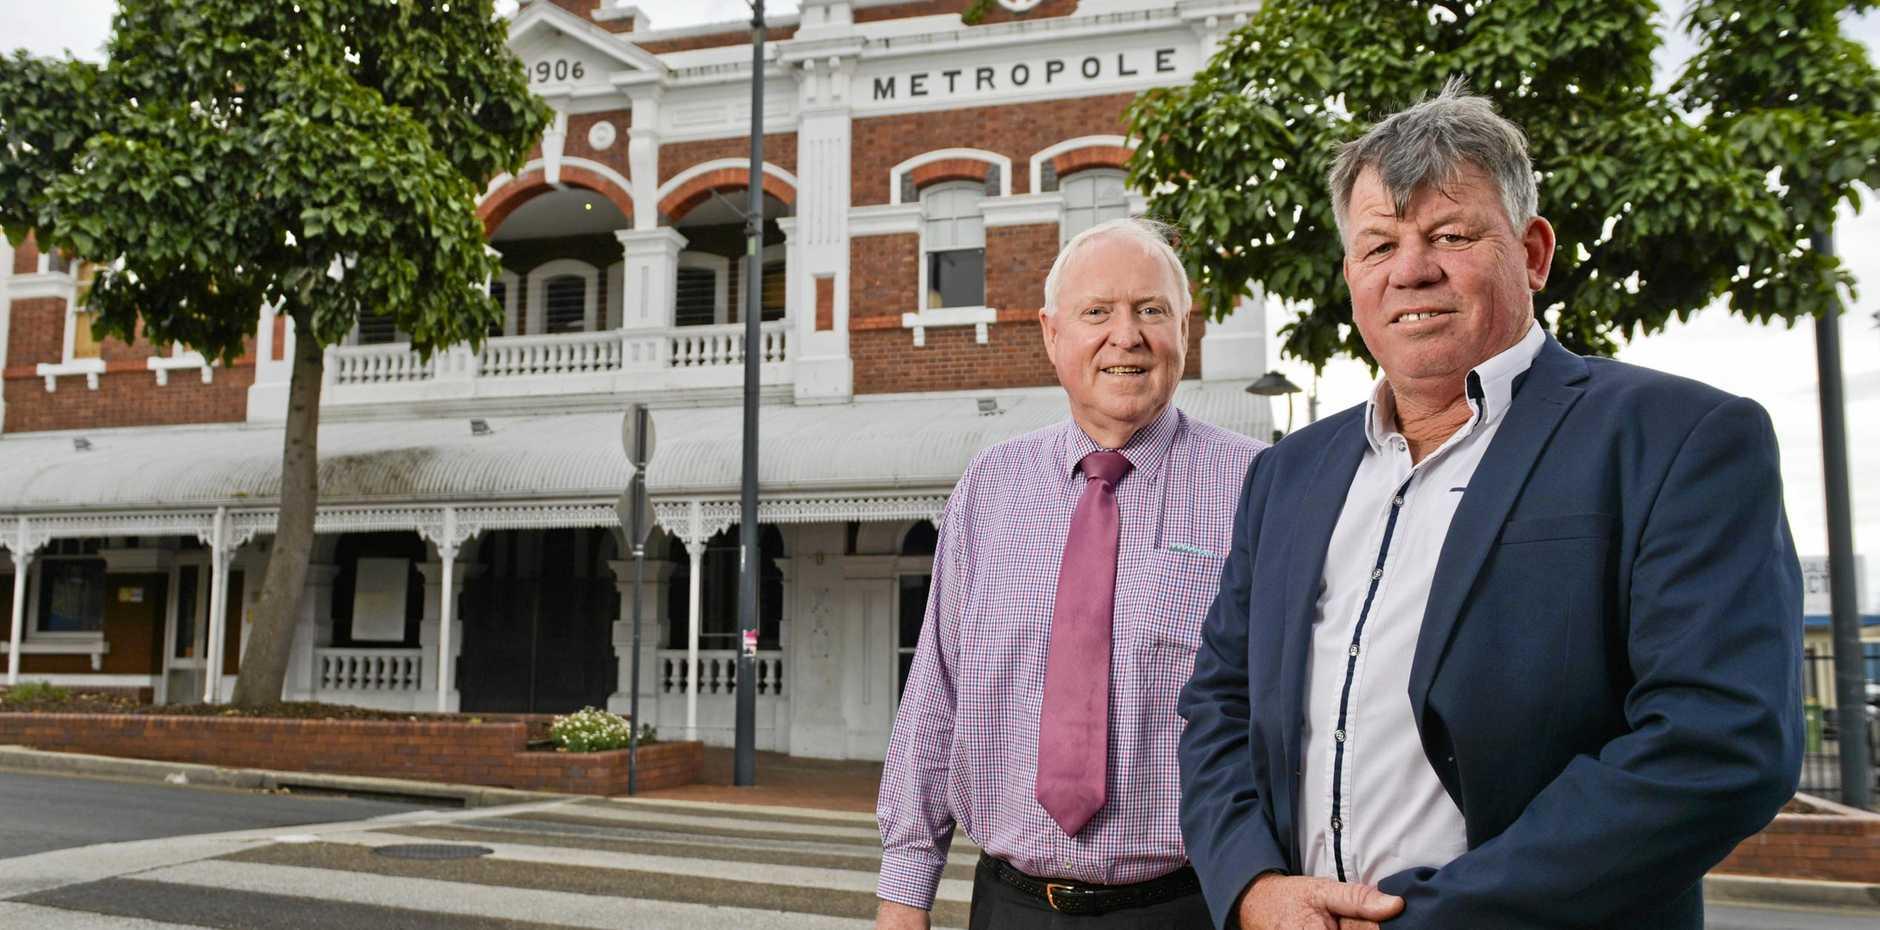 Morrie Marsden and Warren Ramsey, of Ray White Ipswich at Hotel Metropole.